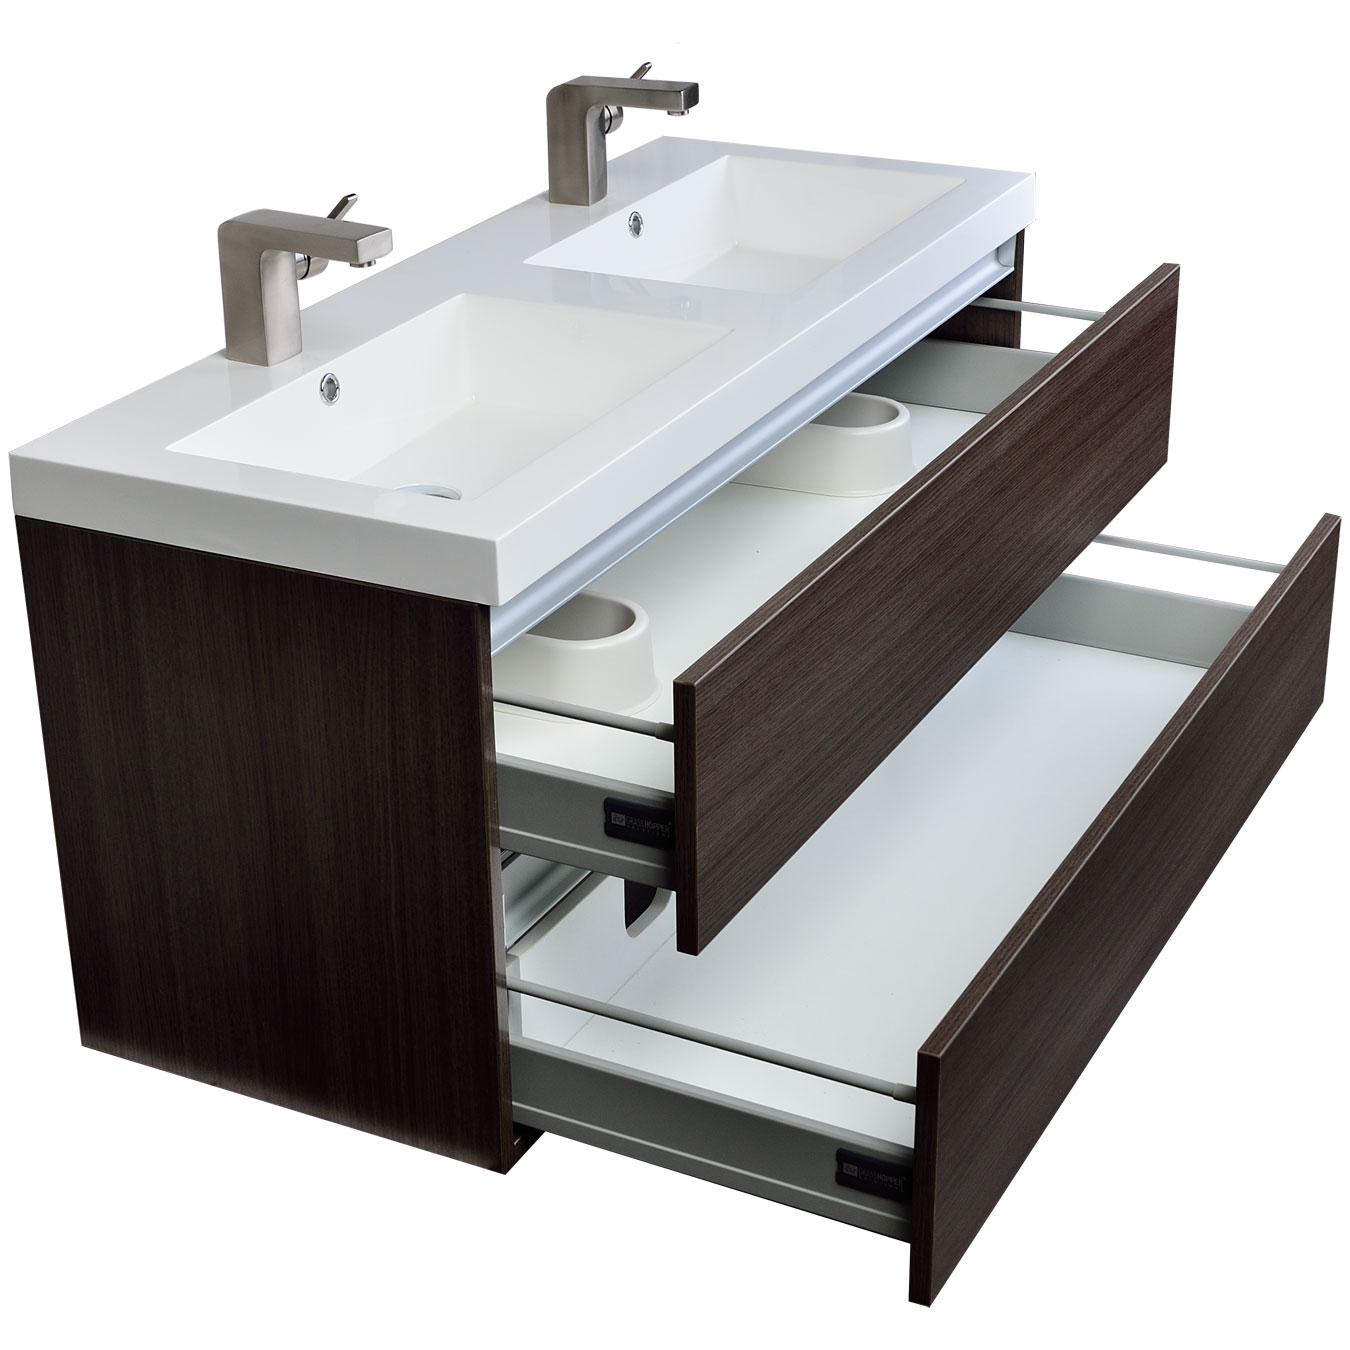 Buy valencia 47 in wall mount double bathroom vanity set - Wall mount bathroom vanity cabinets ...